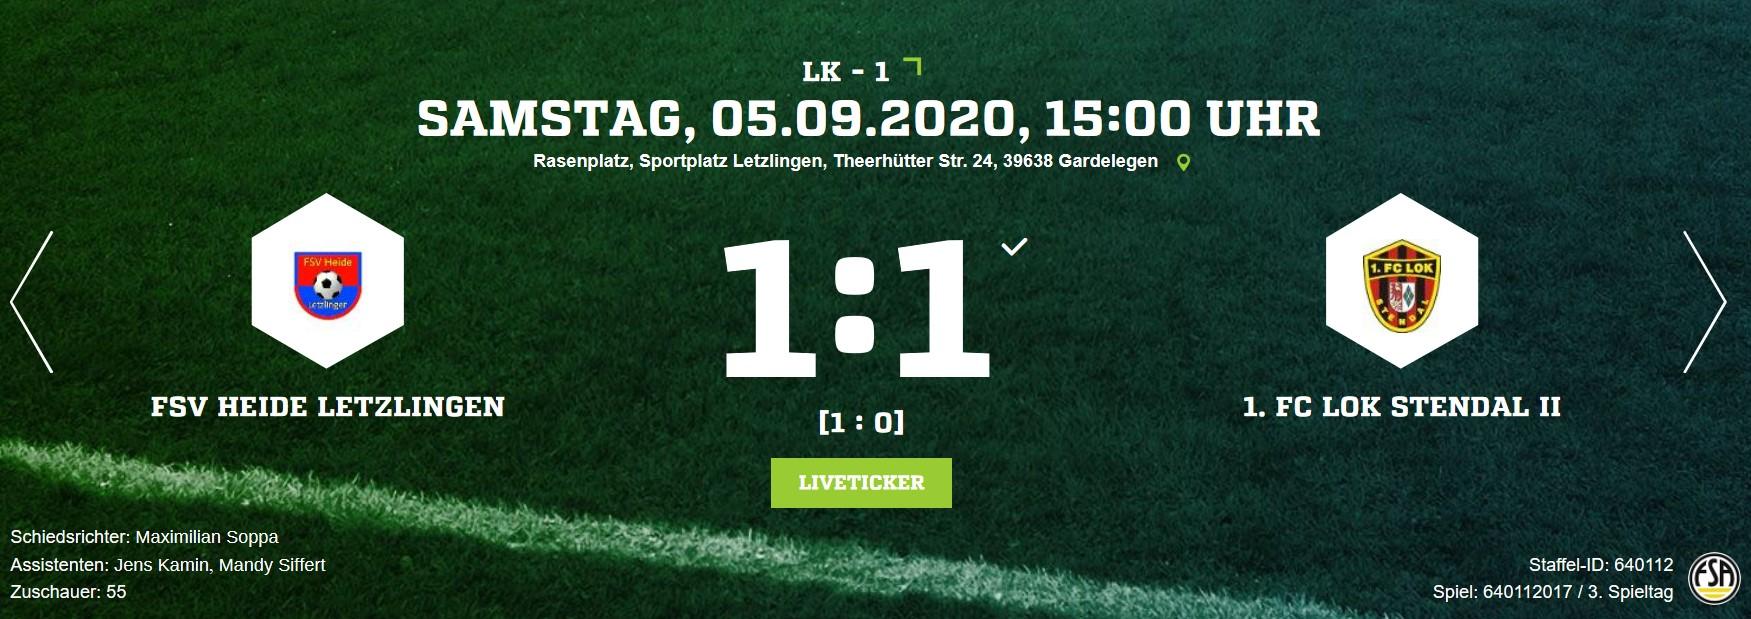 Landesklasse 1 ► 3. Spieltag - 1. FC Lok Stendal